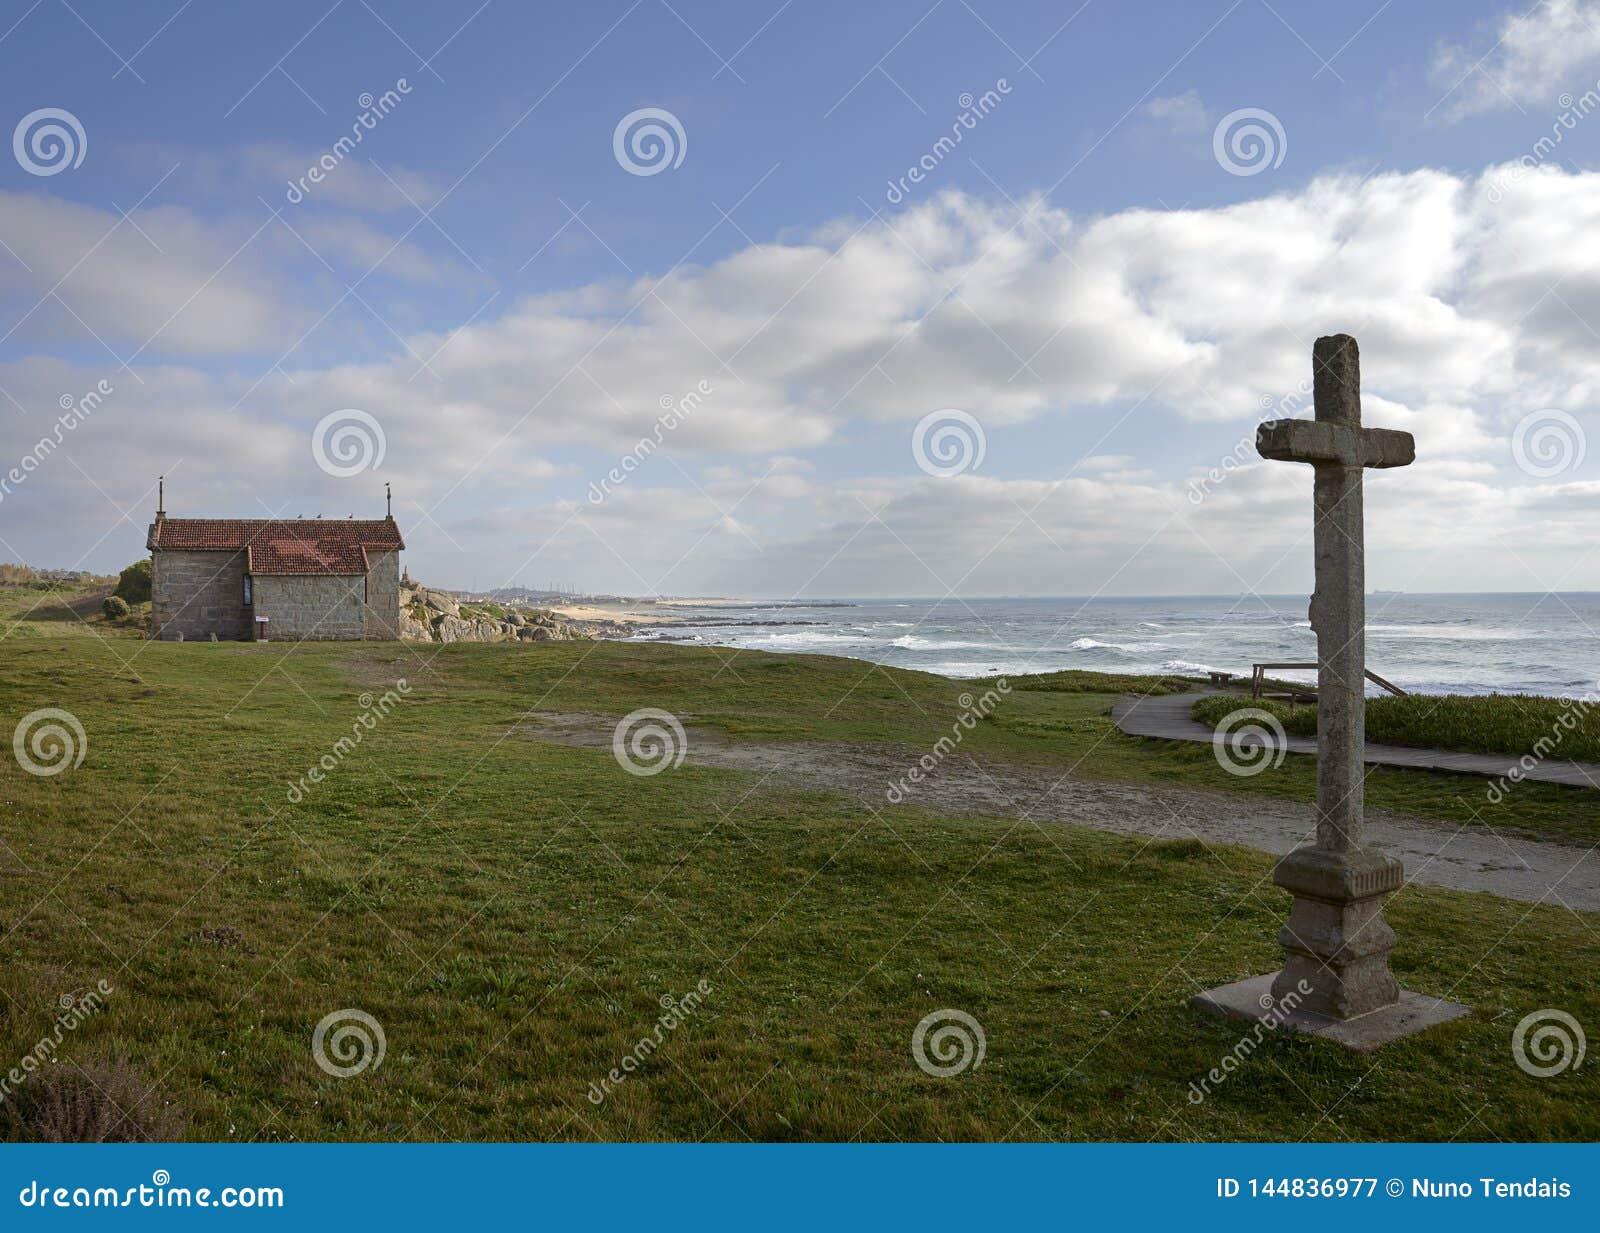 Cruz e iglesia en Castro de São Paio, pasando por alto la playa